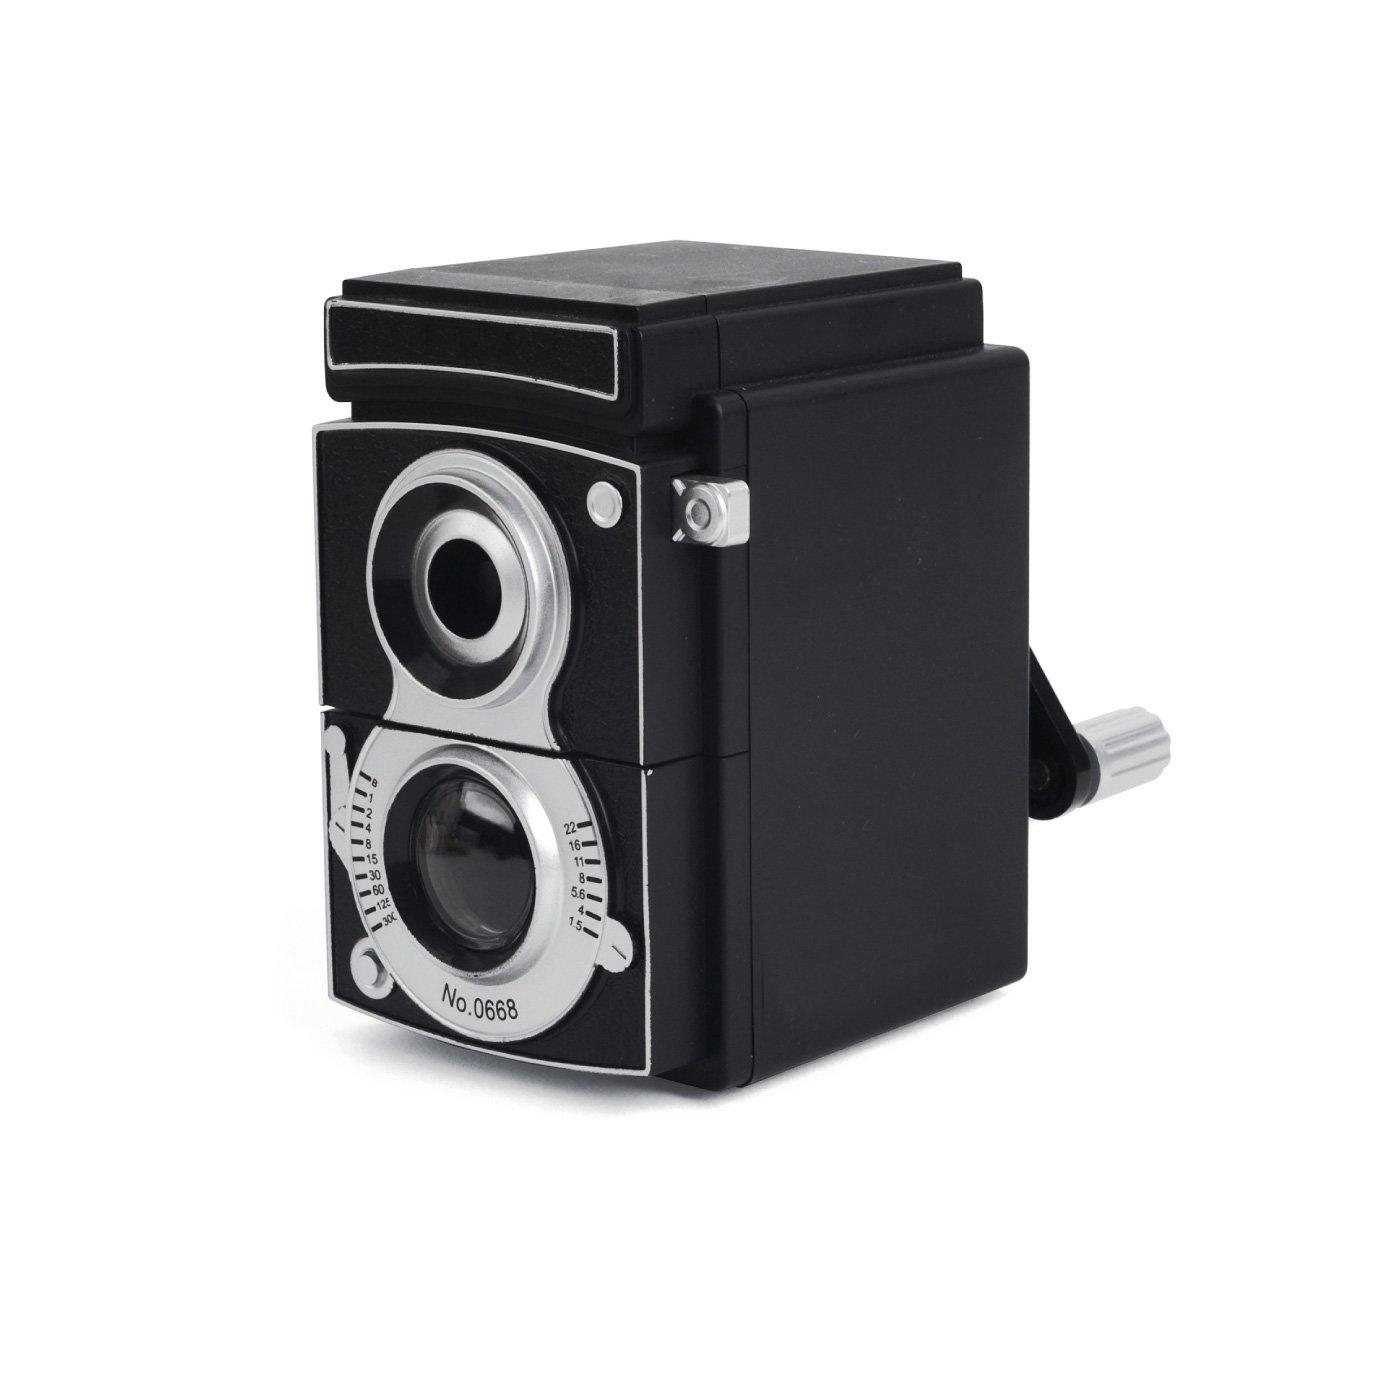 Kikkerland アンティークカメラみたいなペンシルシャープナー